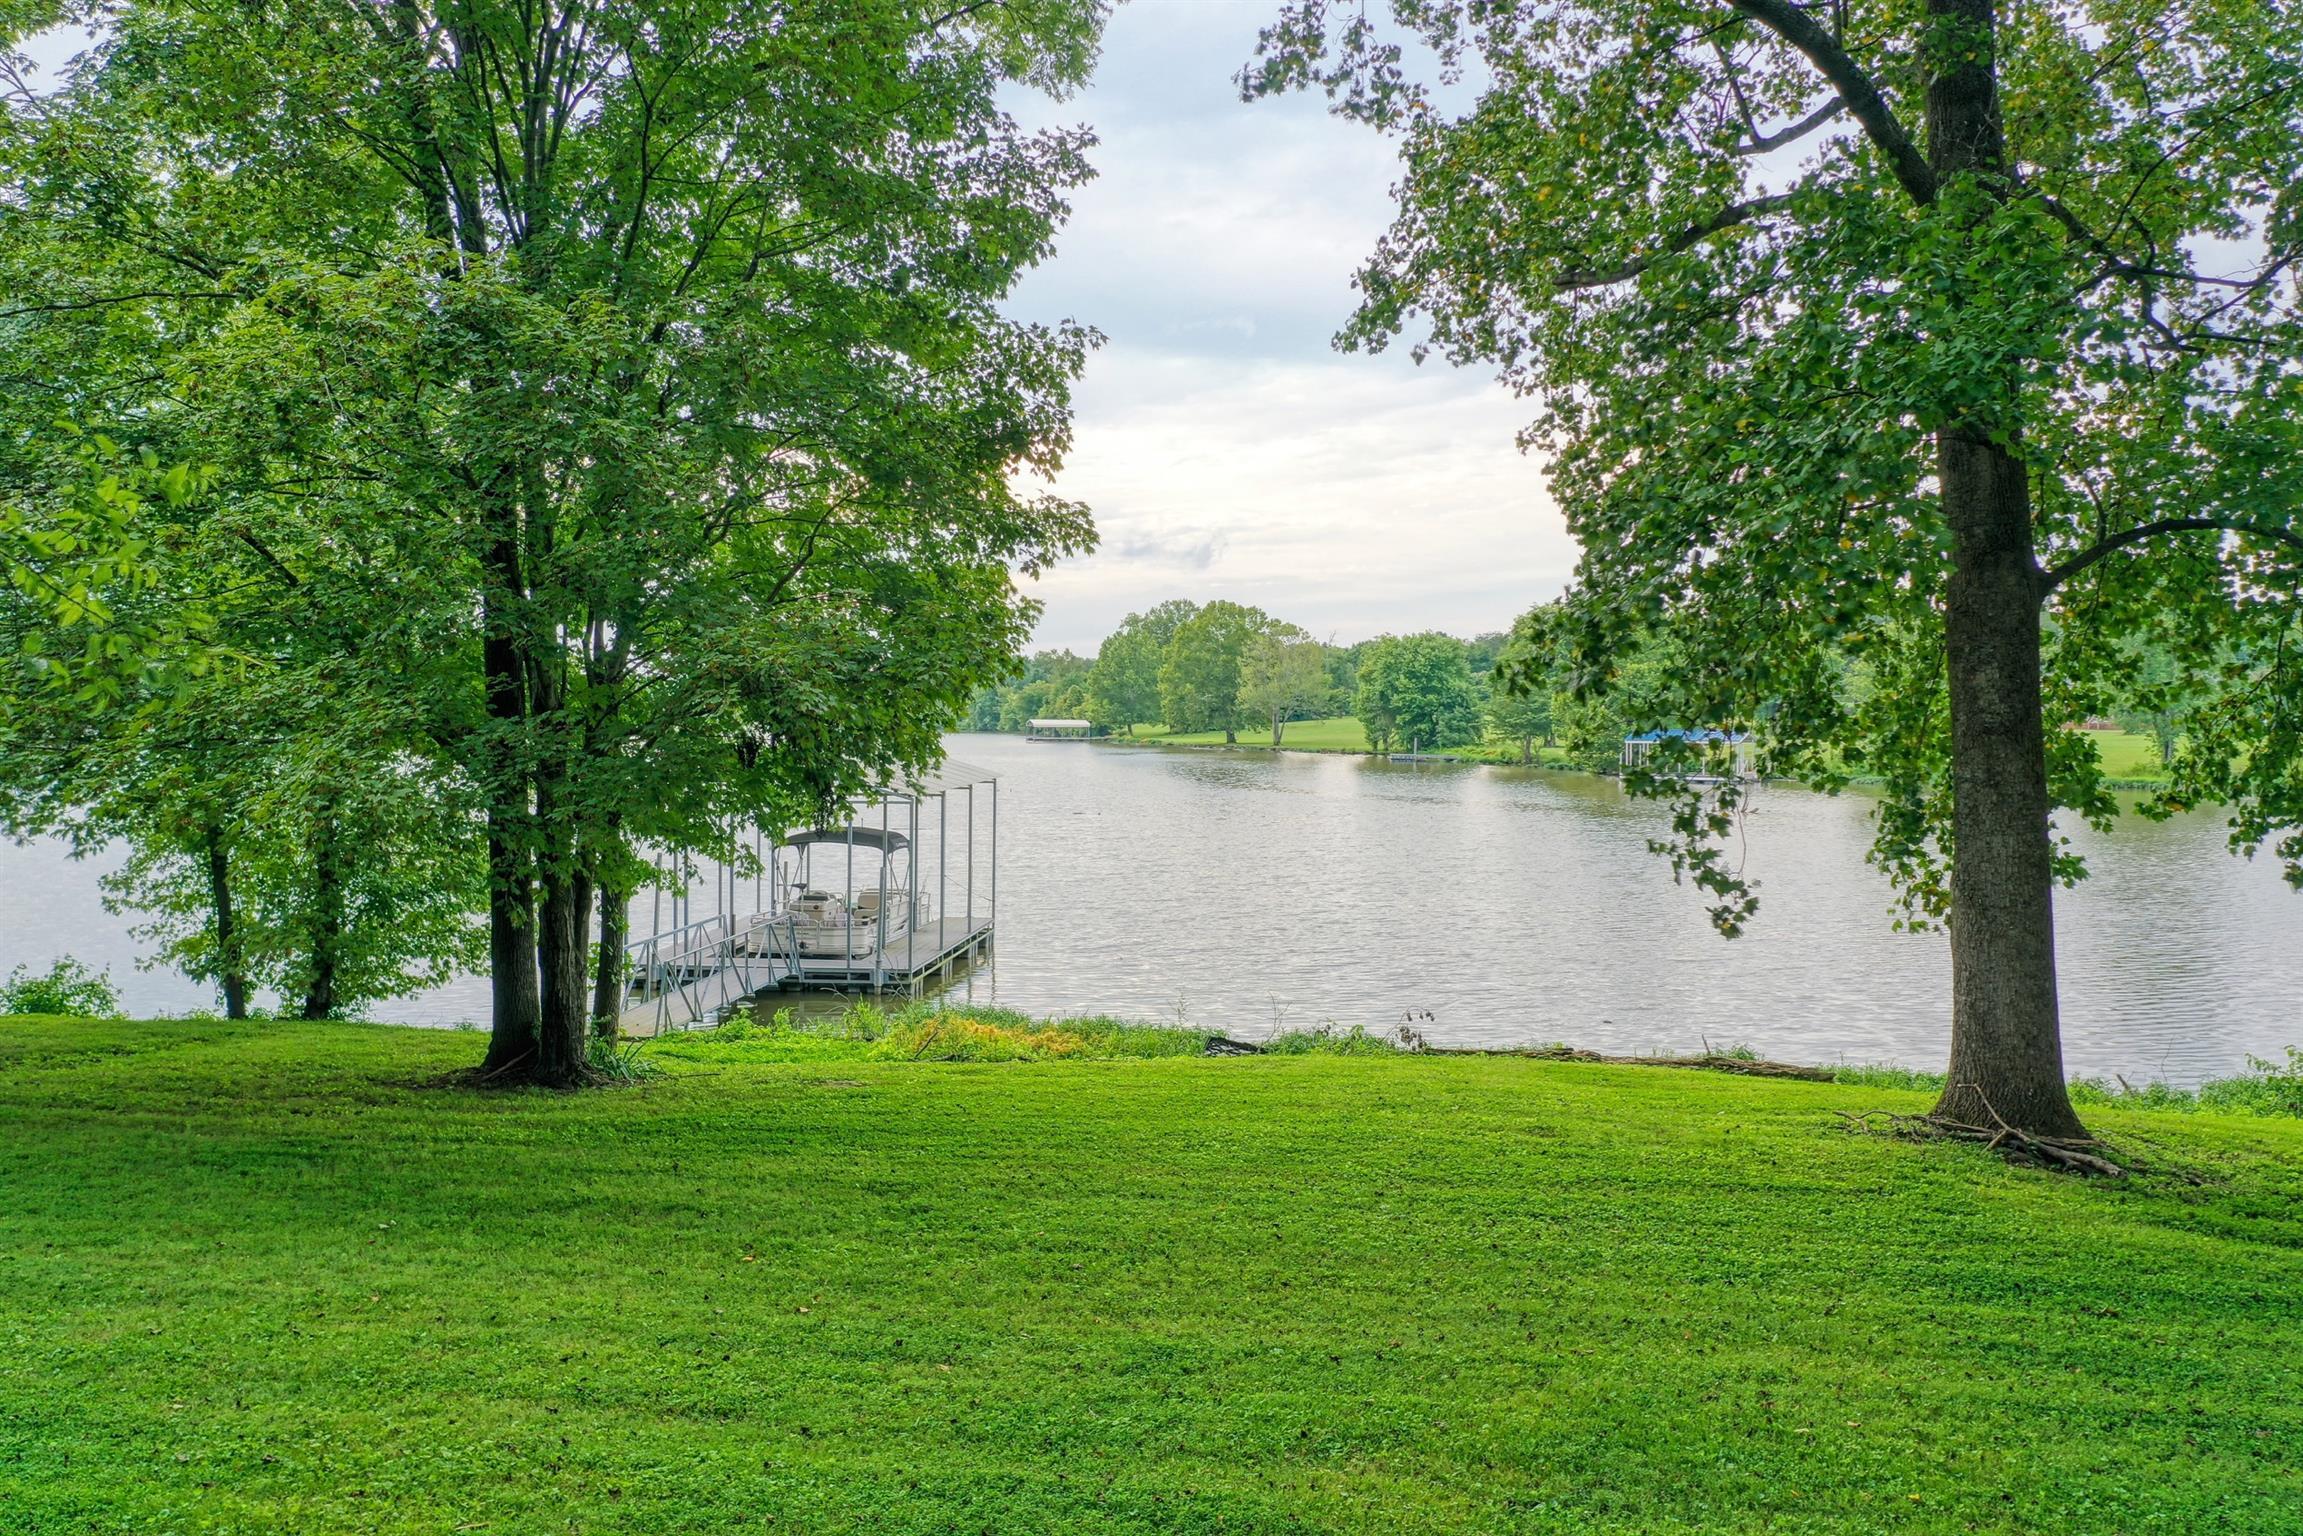 113 Lake Point Dr, Gallatin, TN 37066 - Gallatin, TN real estate listing